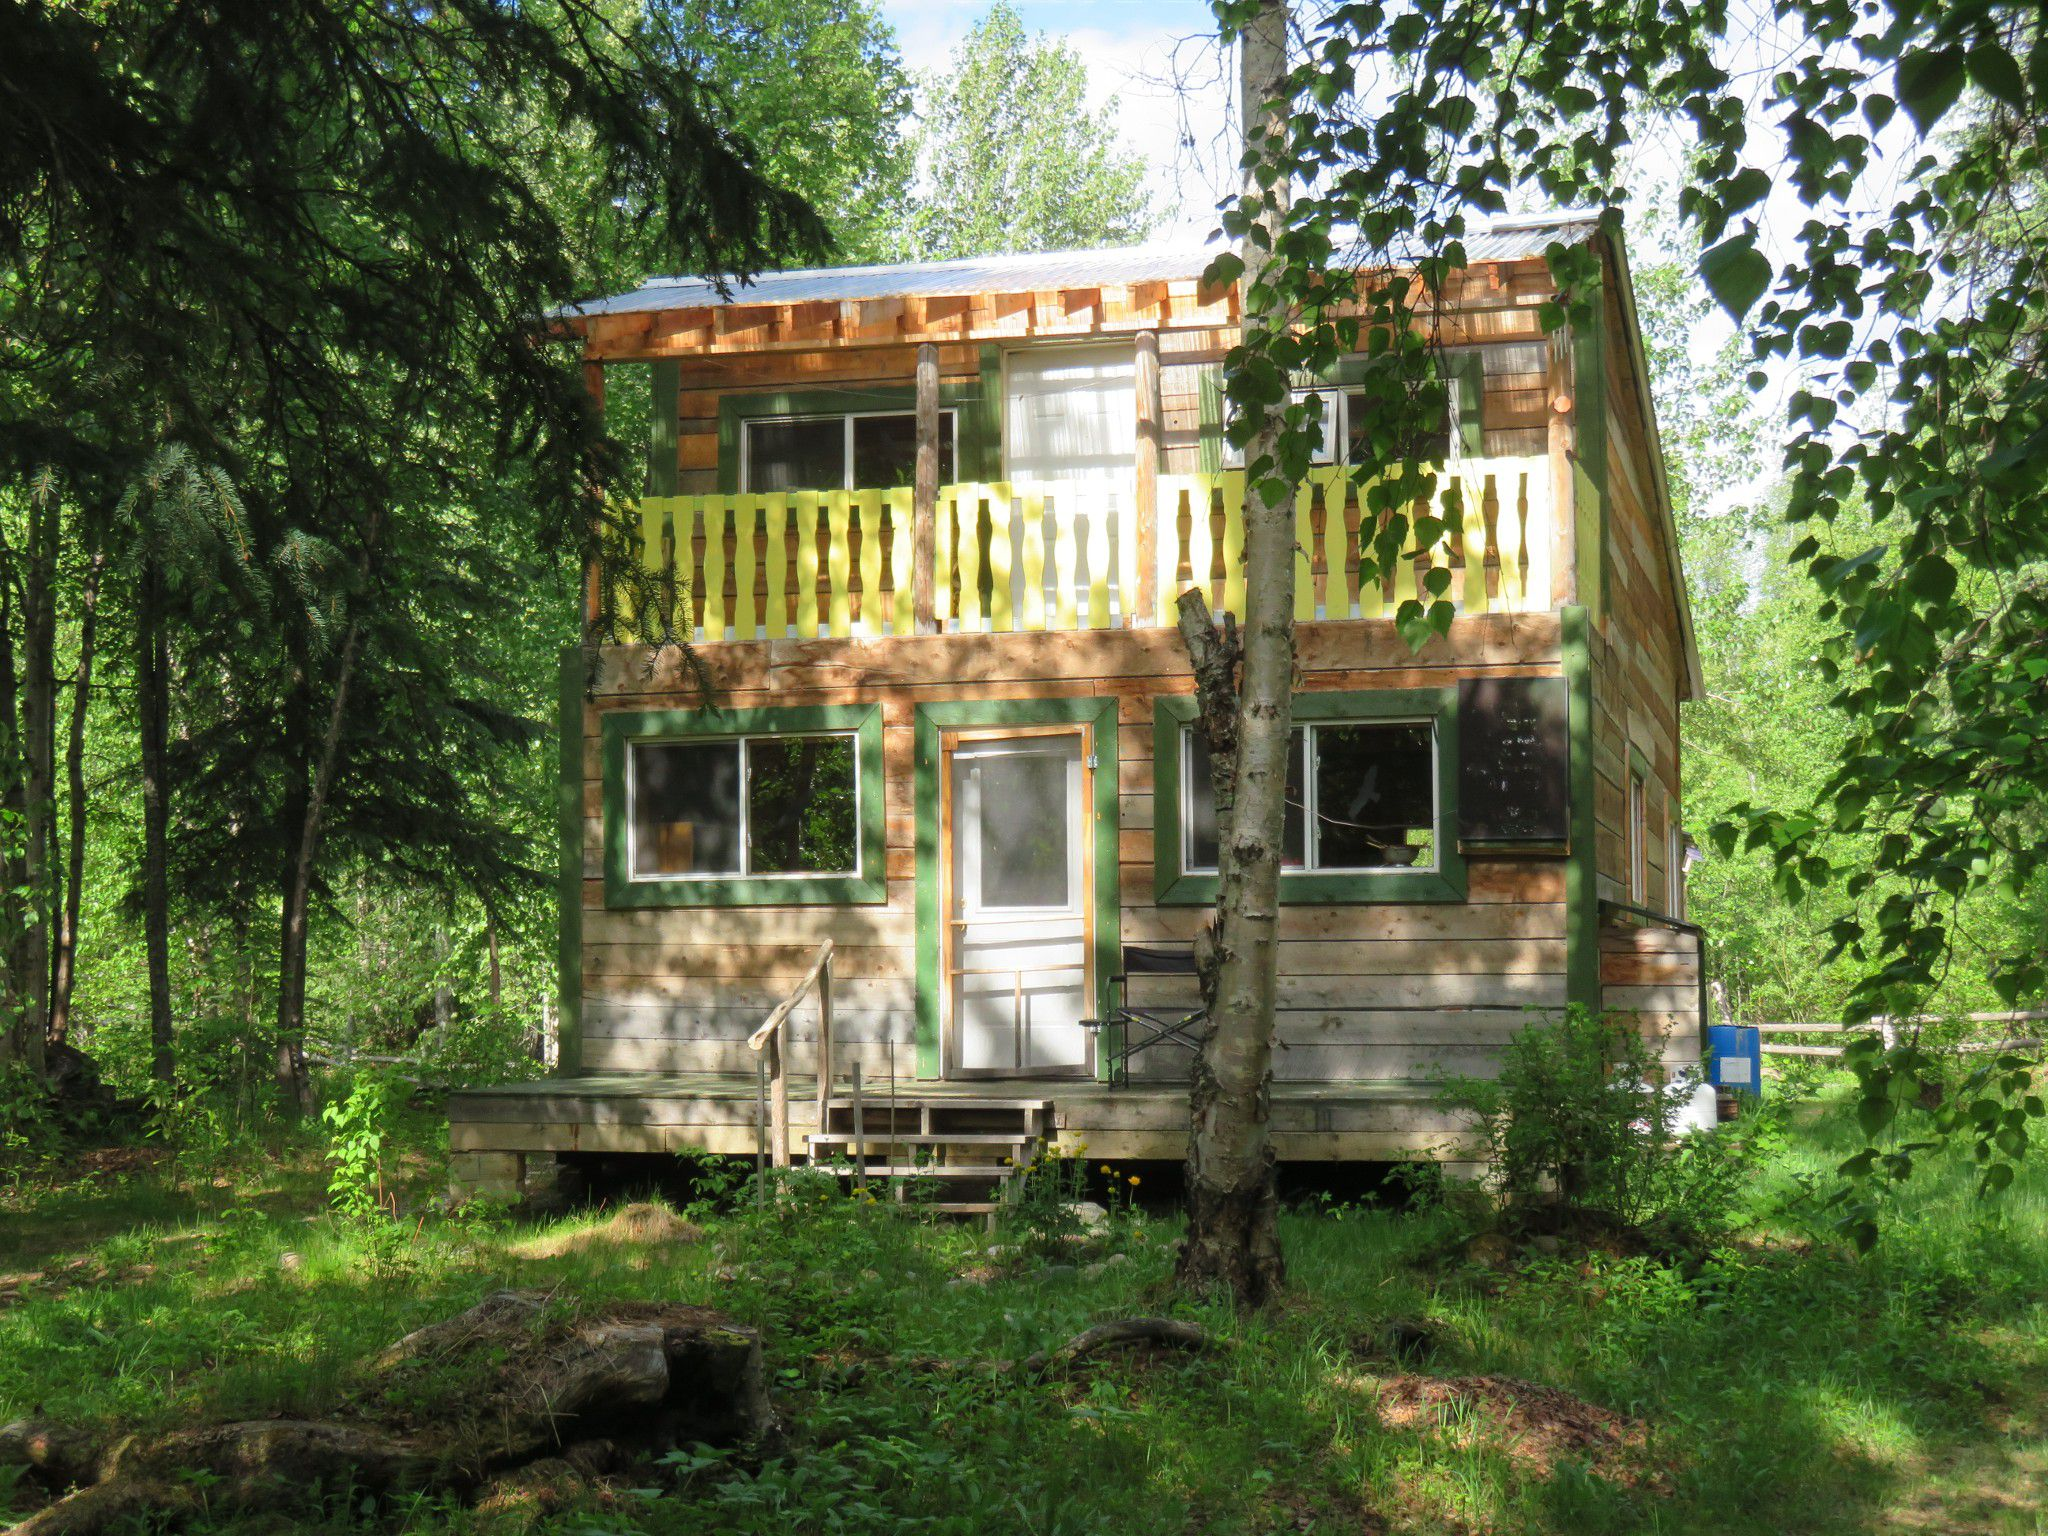 Main Photo: LOT 4 MILE 375 ALASKA Highway in Fort Nelson: Fort Nelson - Remote House for sale (Fort Nelson (Zone 64))  : MLS®# R2233798